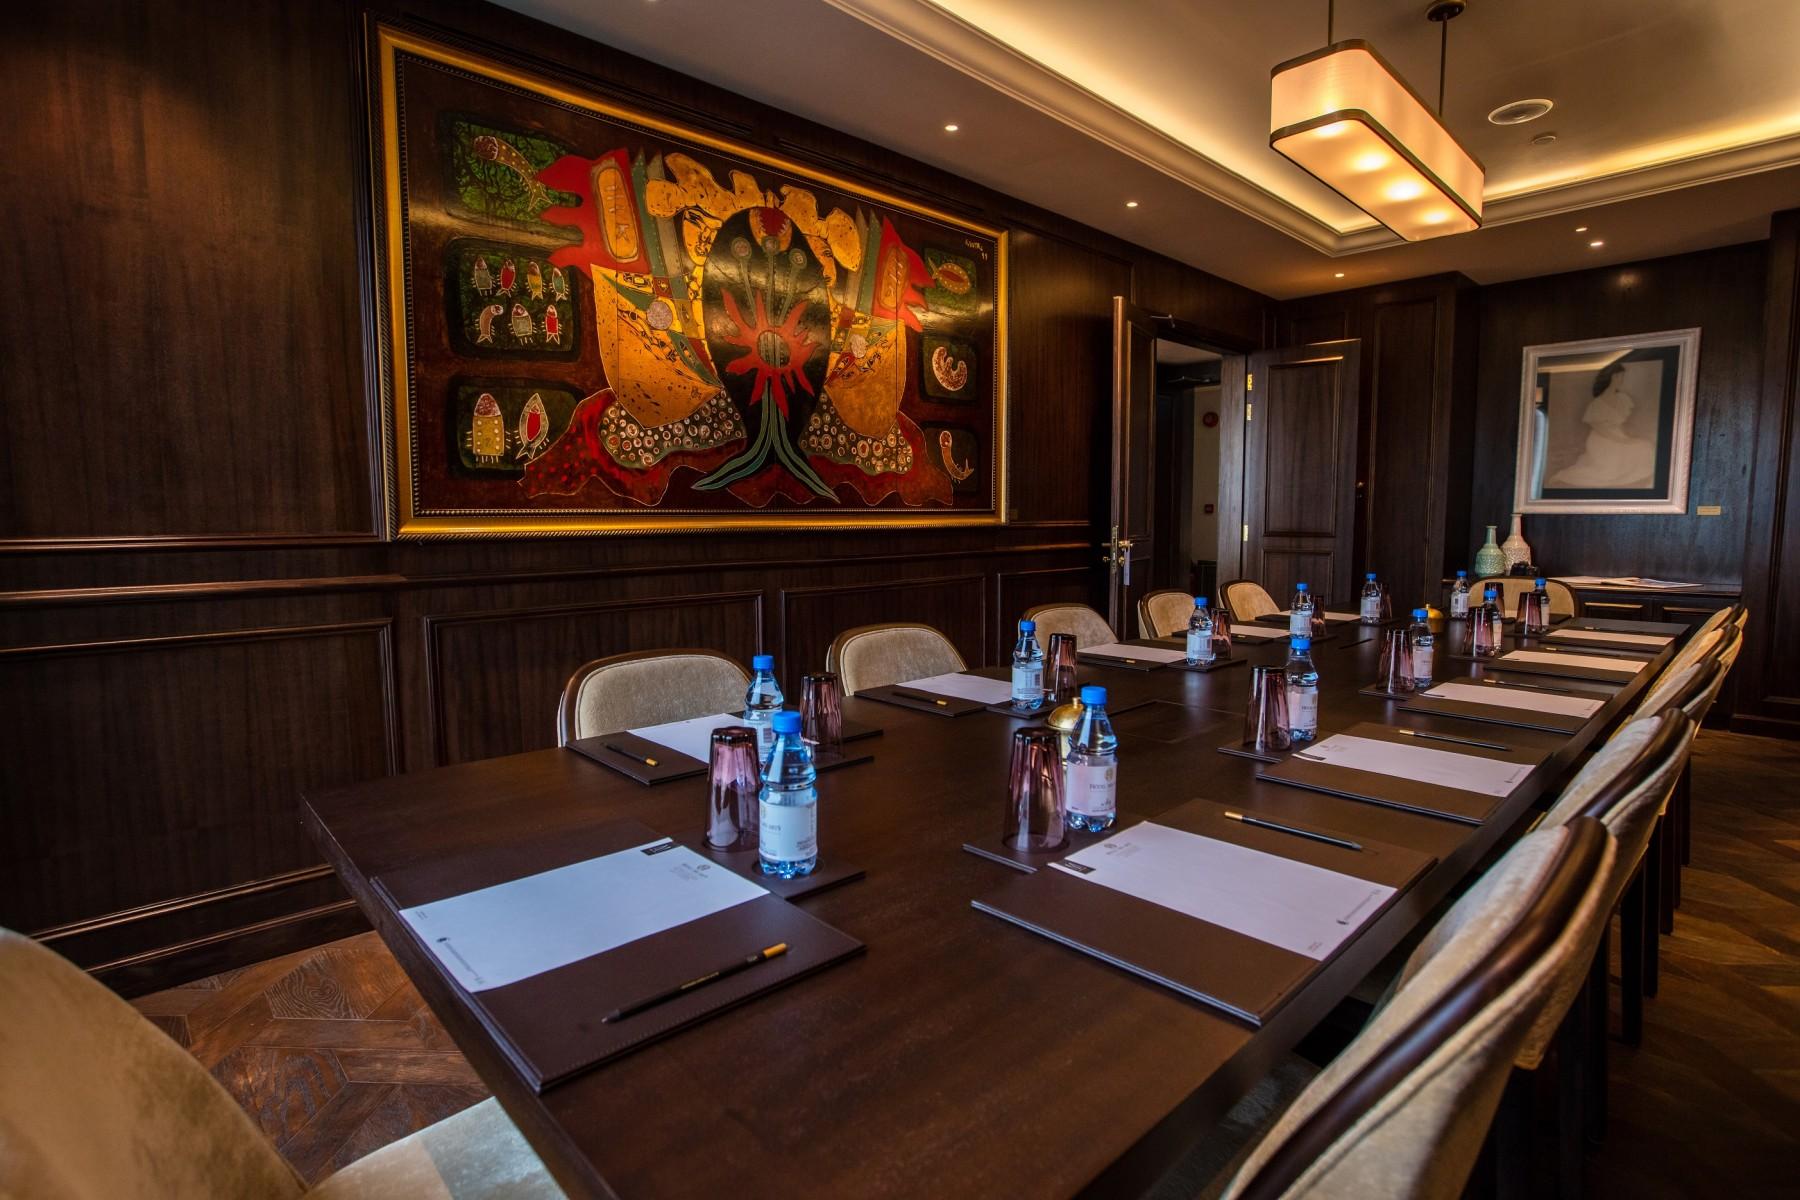 Meeting Rooms Rental - Exhibit Space   Cragun's Resort  Luxury Meeting Space